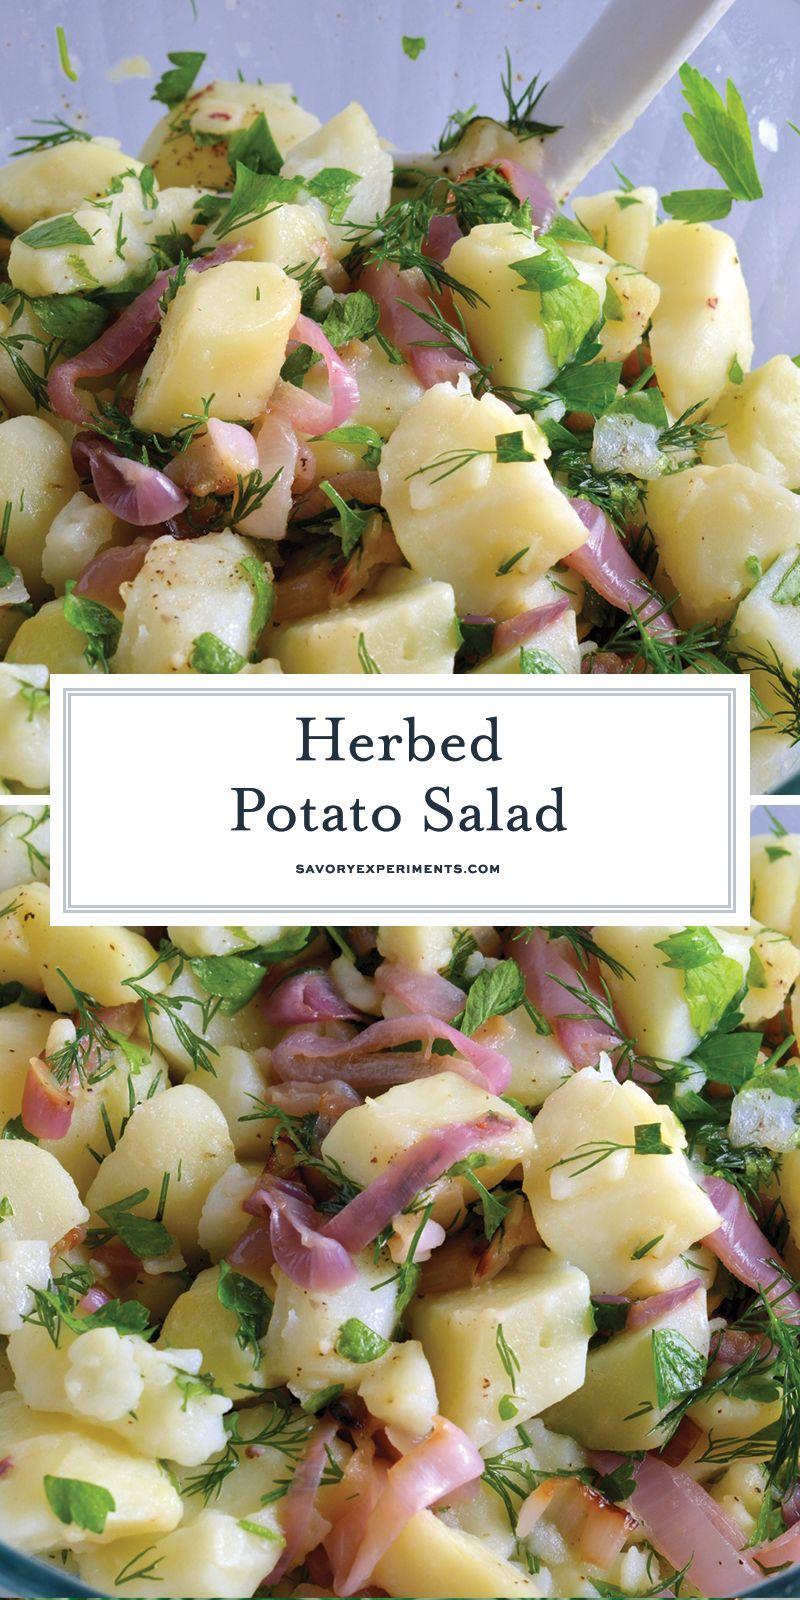 Herbed Potato Salad Is Mayo Free Potato Salad Recipe That Uses Fresh Herbs And Mild White Wine Vinegar To Potatoe Salad Recipe Herbed Potato Salad Potato Salad [ 1600 x 800 Pixel ]